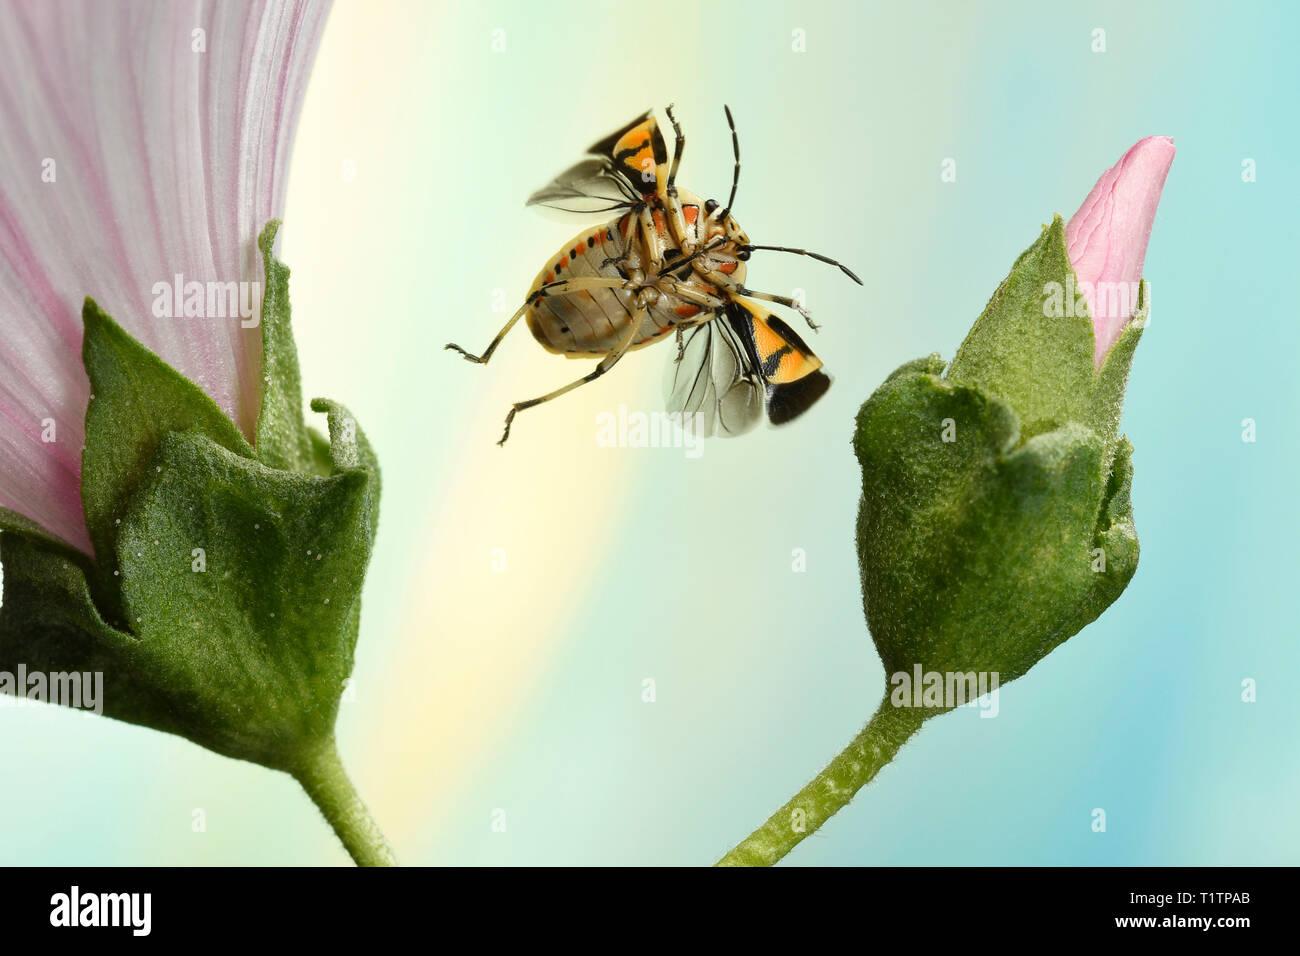 Schmuckwanze (Eurydema ornata), im Flug, an Malve (Malva), Deutschland Stock Photo